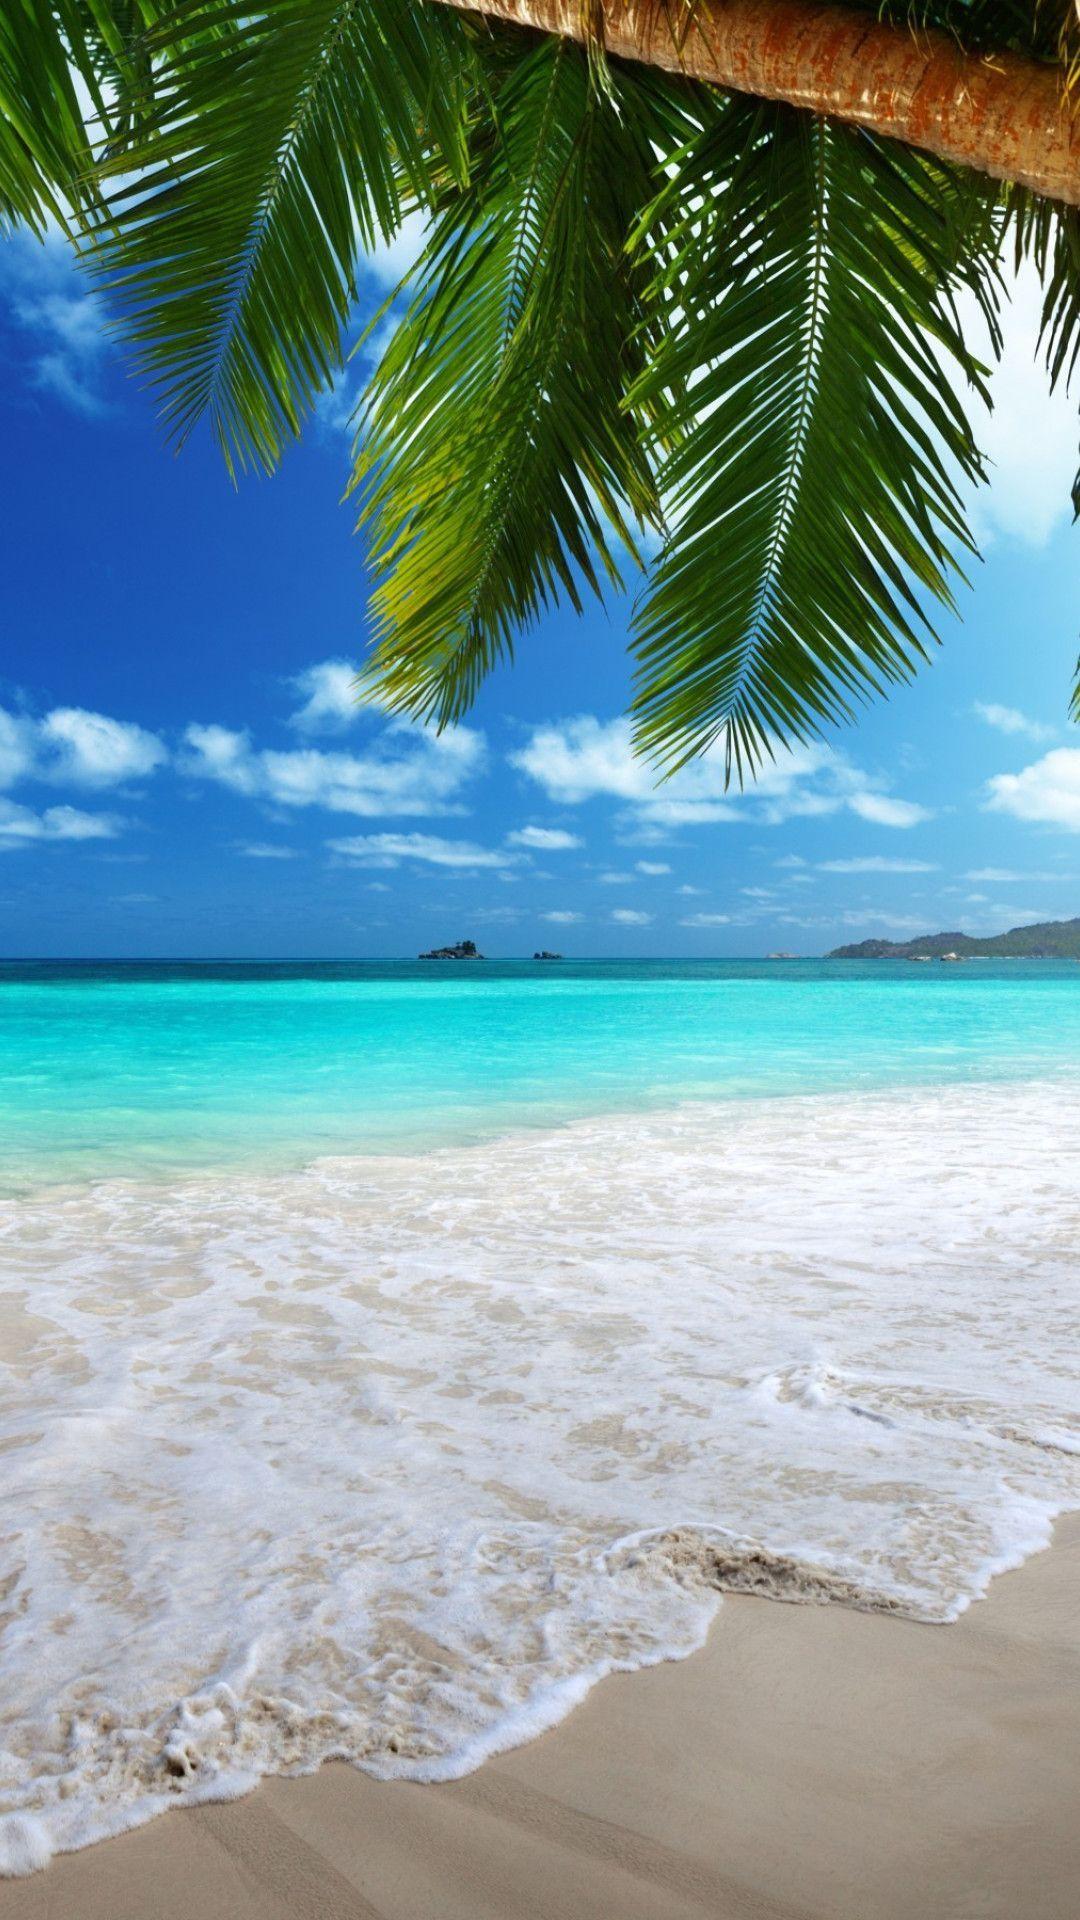 1080x1920 Beach Iphone Wallpaper Hd 90 Images Com Imagens